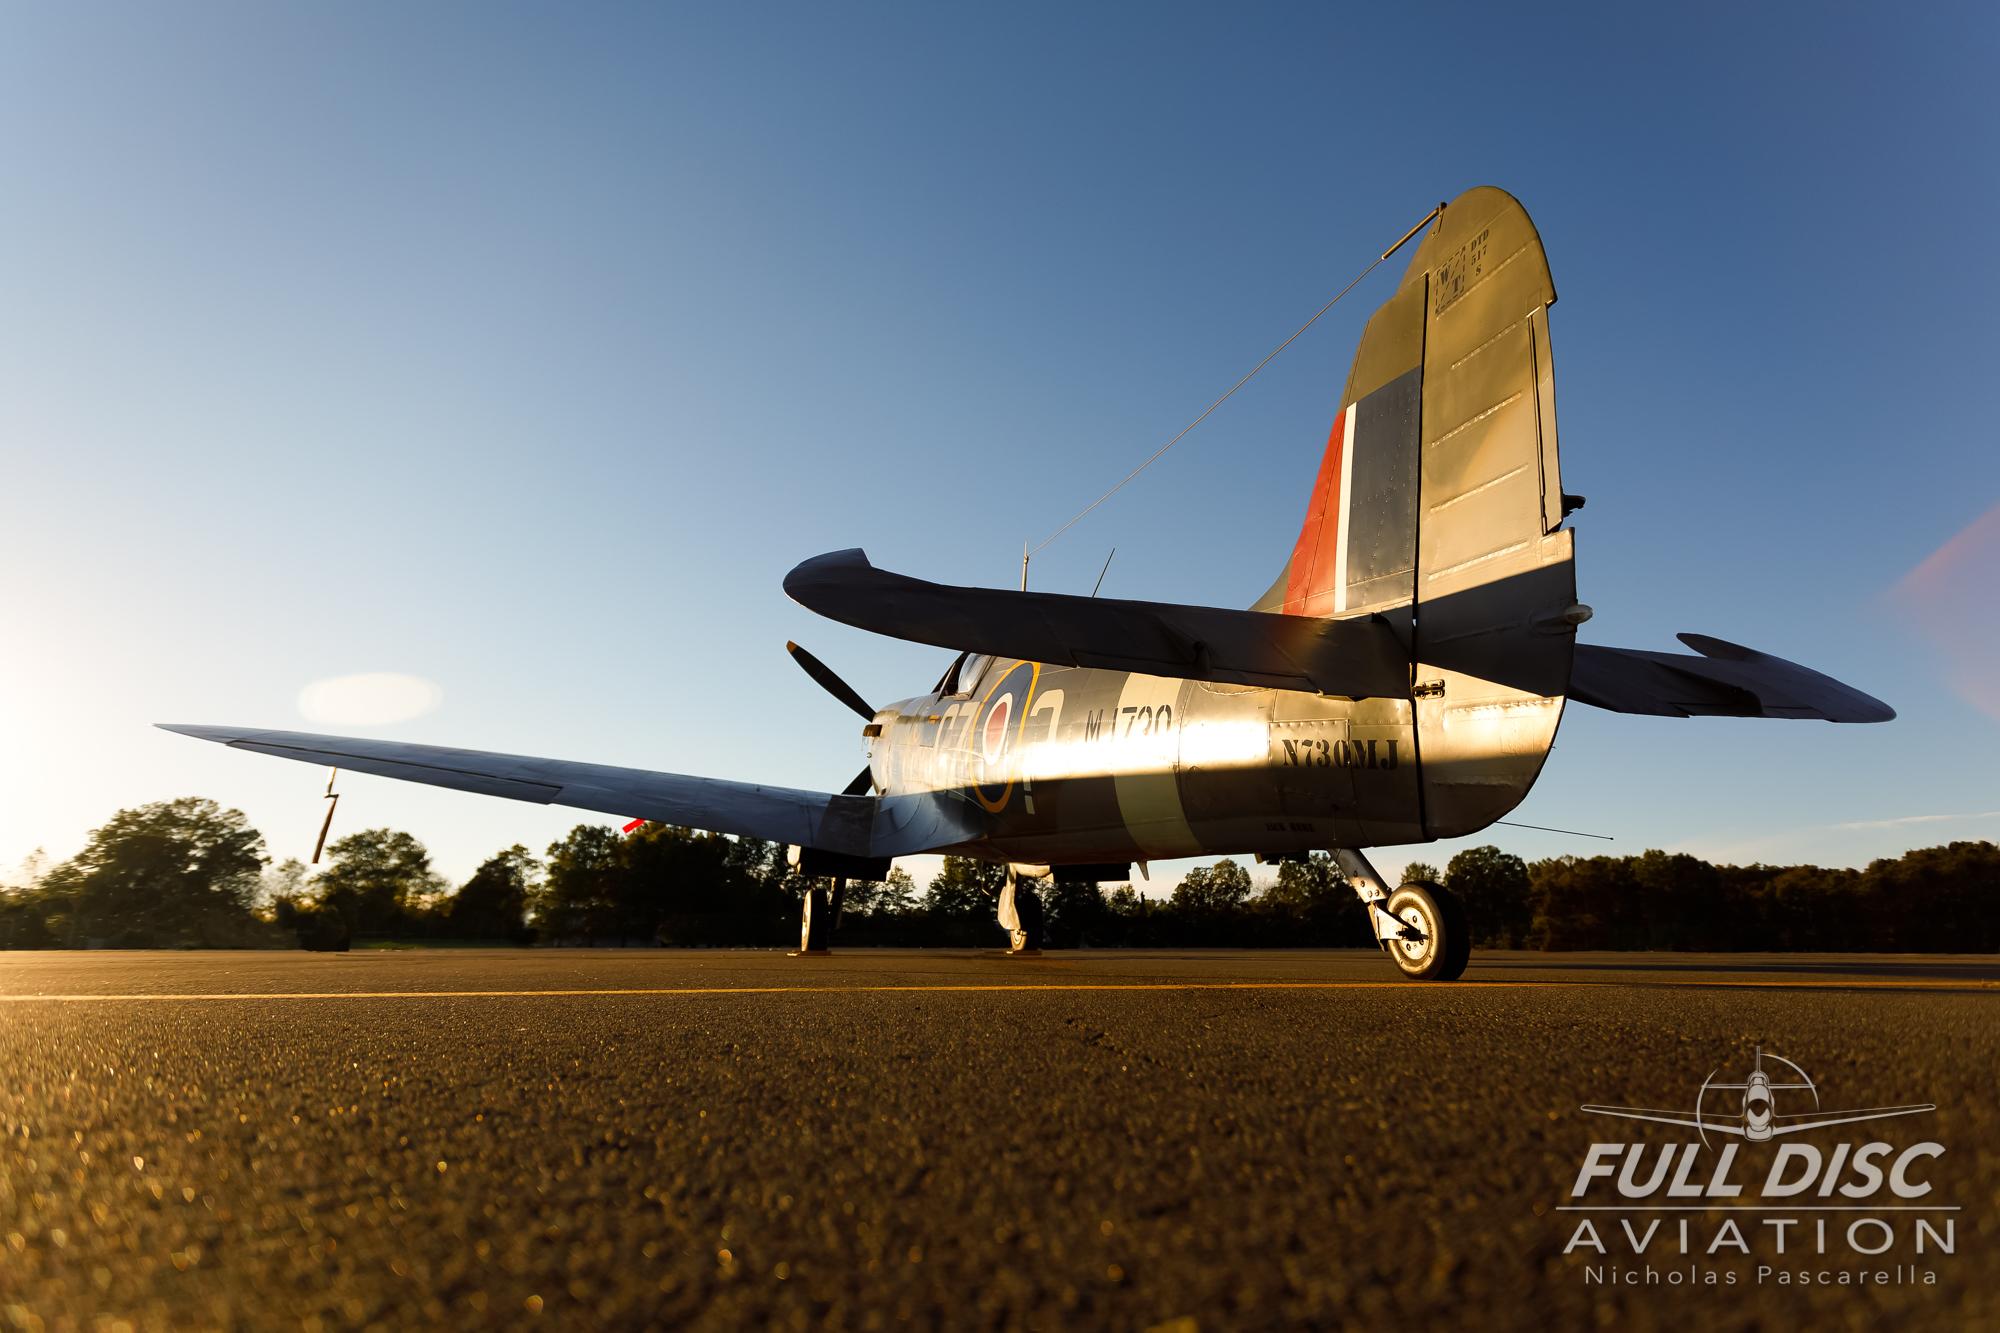 nickpascarella_nicholaspascarella_fulldiscaviation_aircraft_spitfire_inrepose.jpg